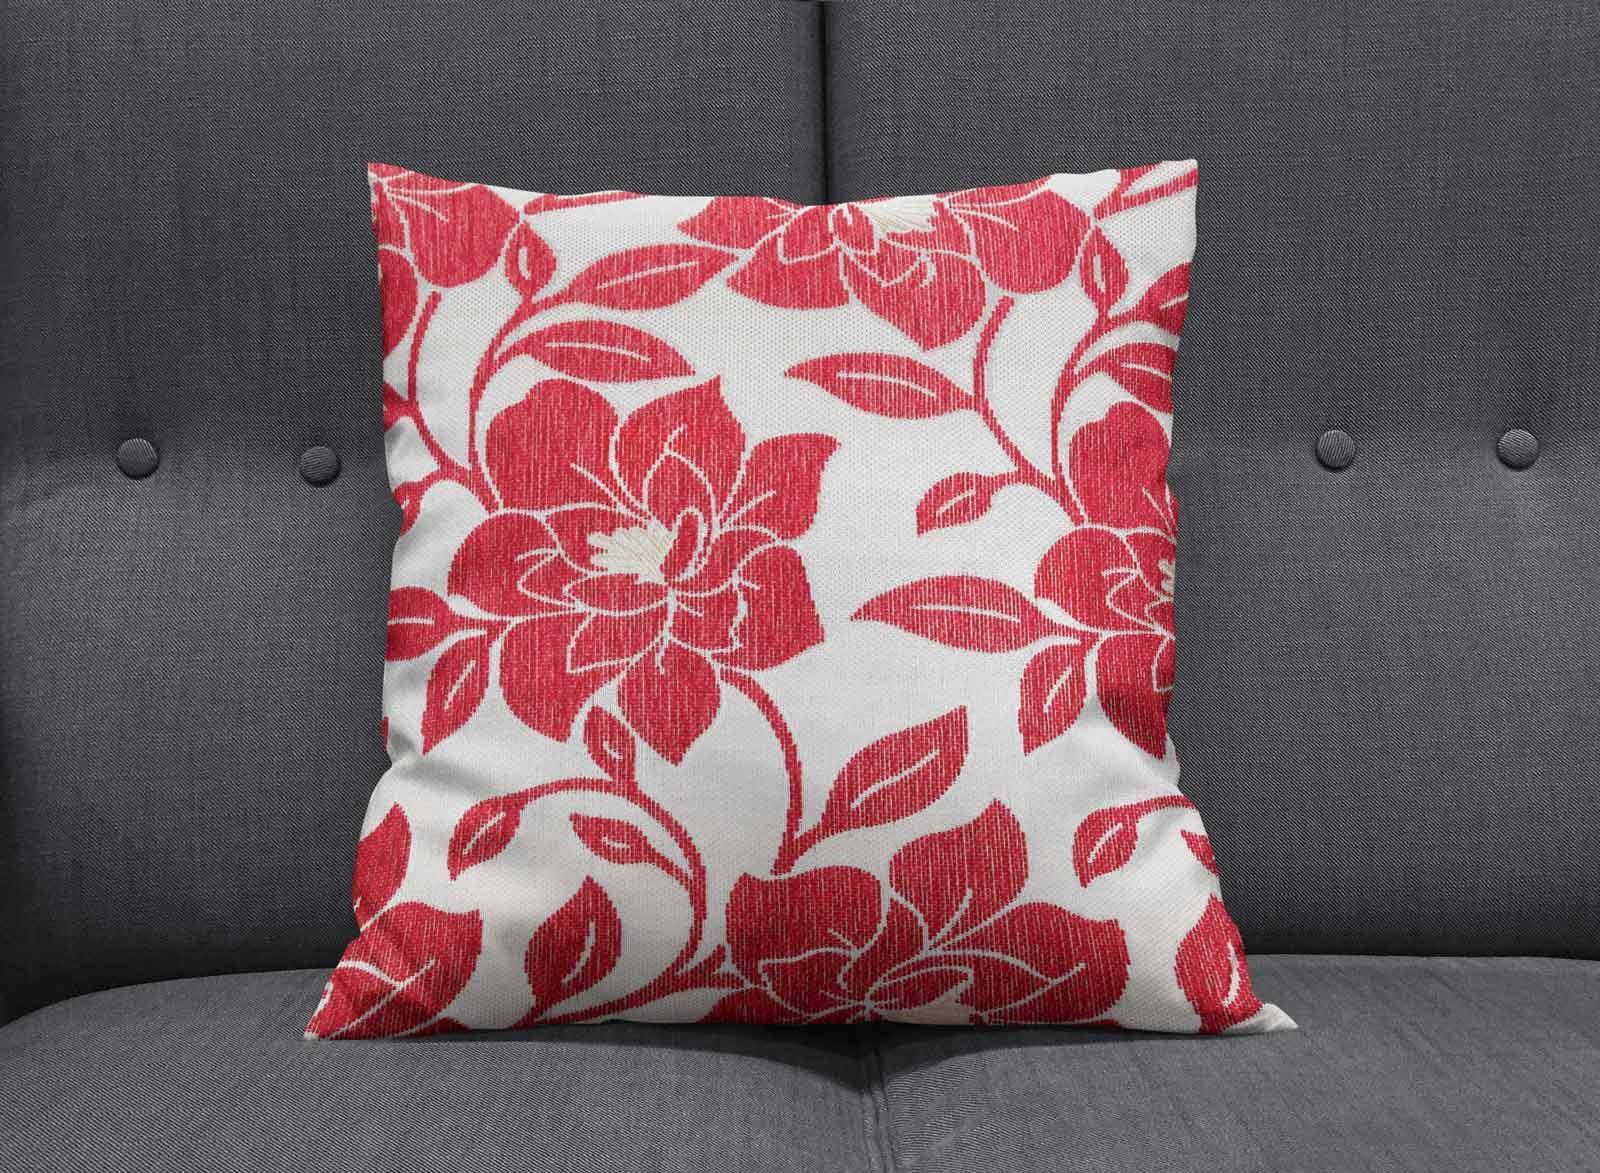 Vino-Tinto-Cushion-Covers-Coleccion-17-034-18-034-43cm-45cm-Cubierta miniatura 52